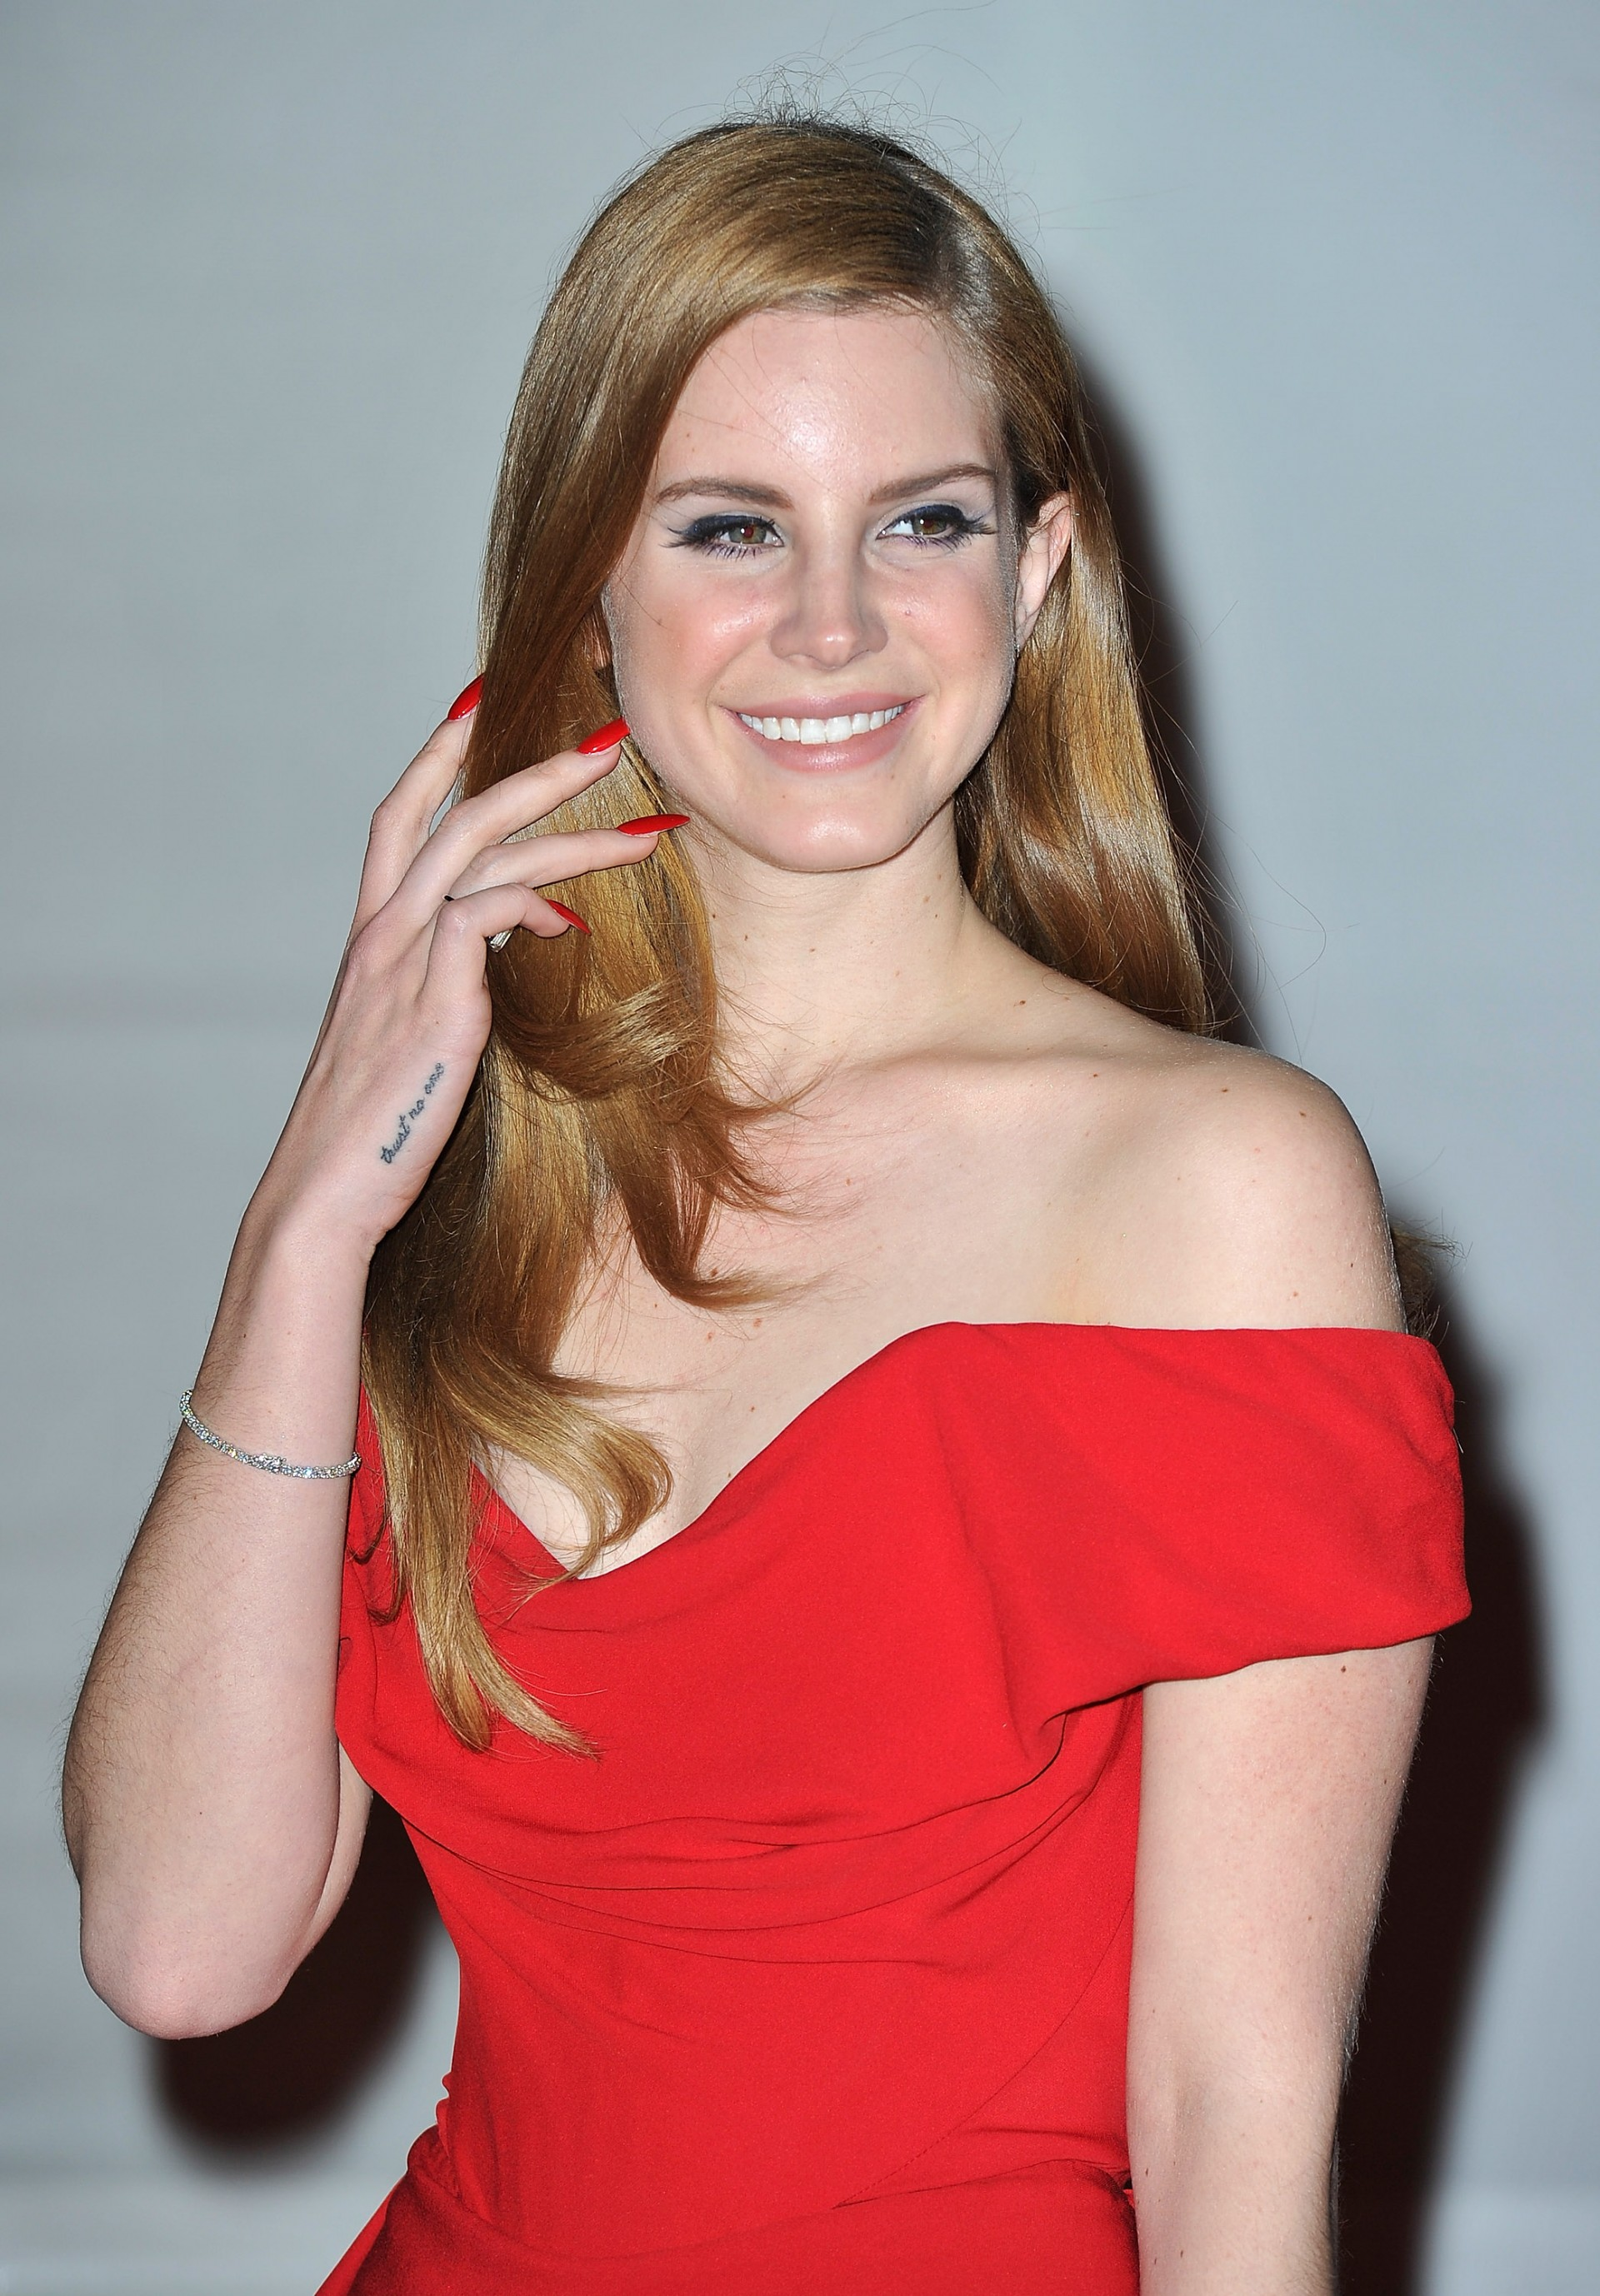 An Ode To Lana Del Rey's 'Burn Dress'